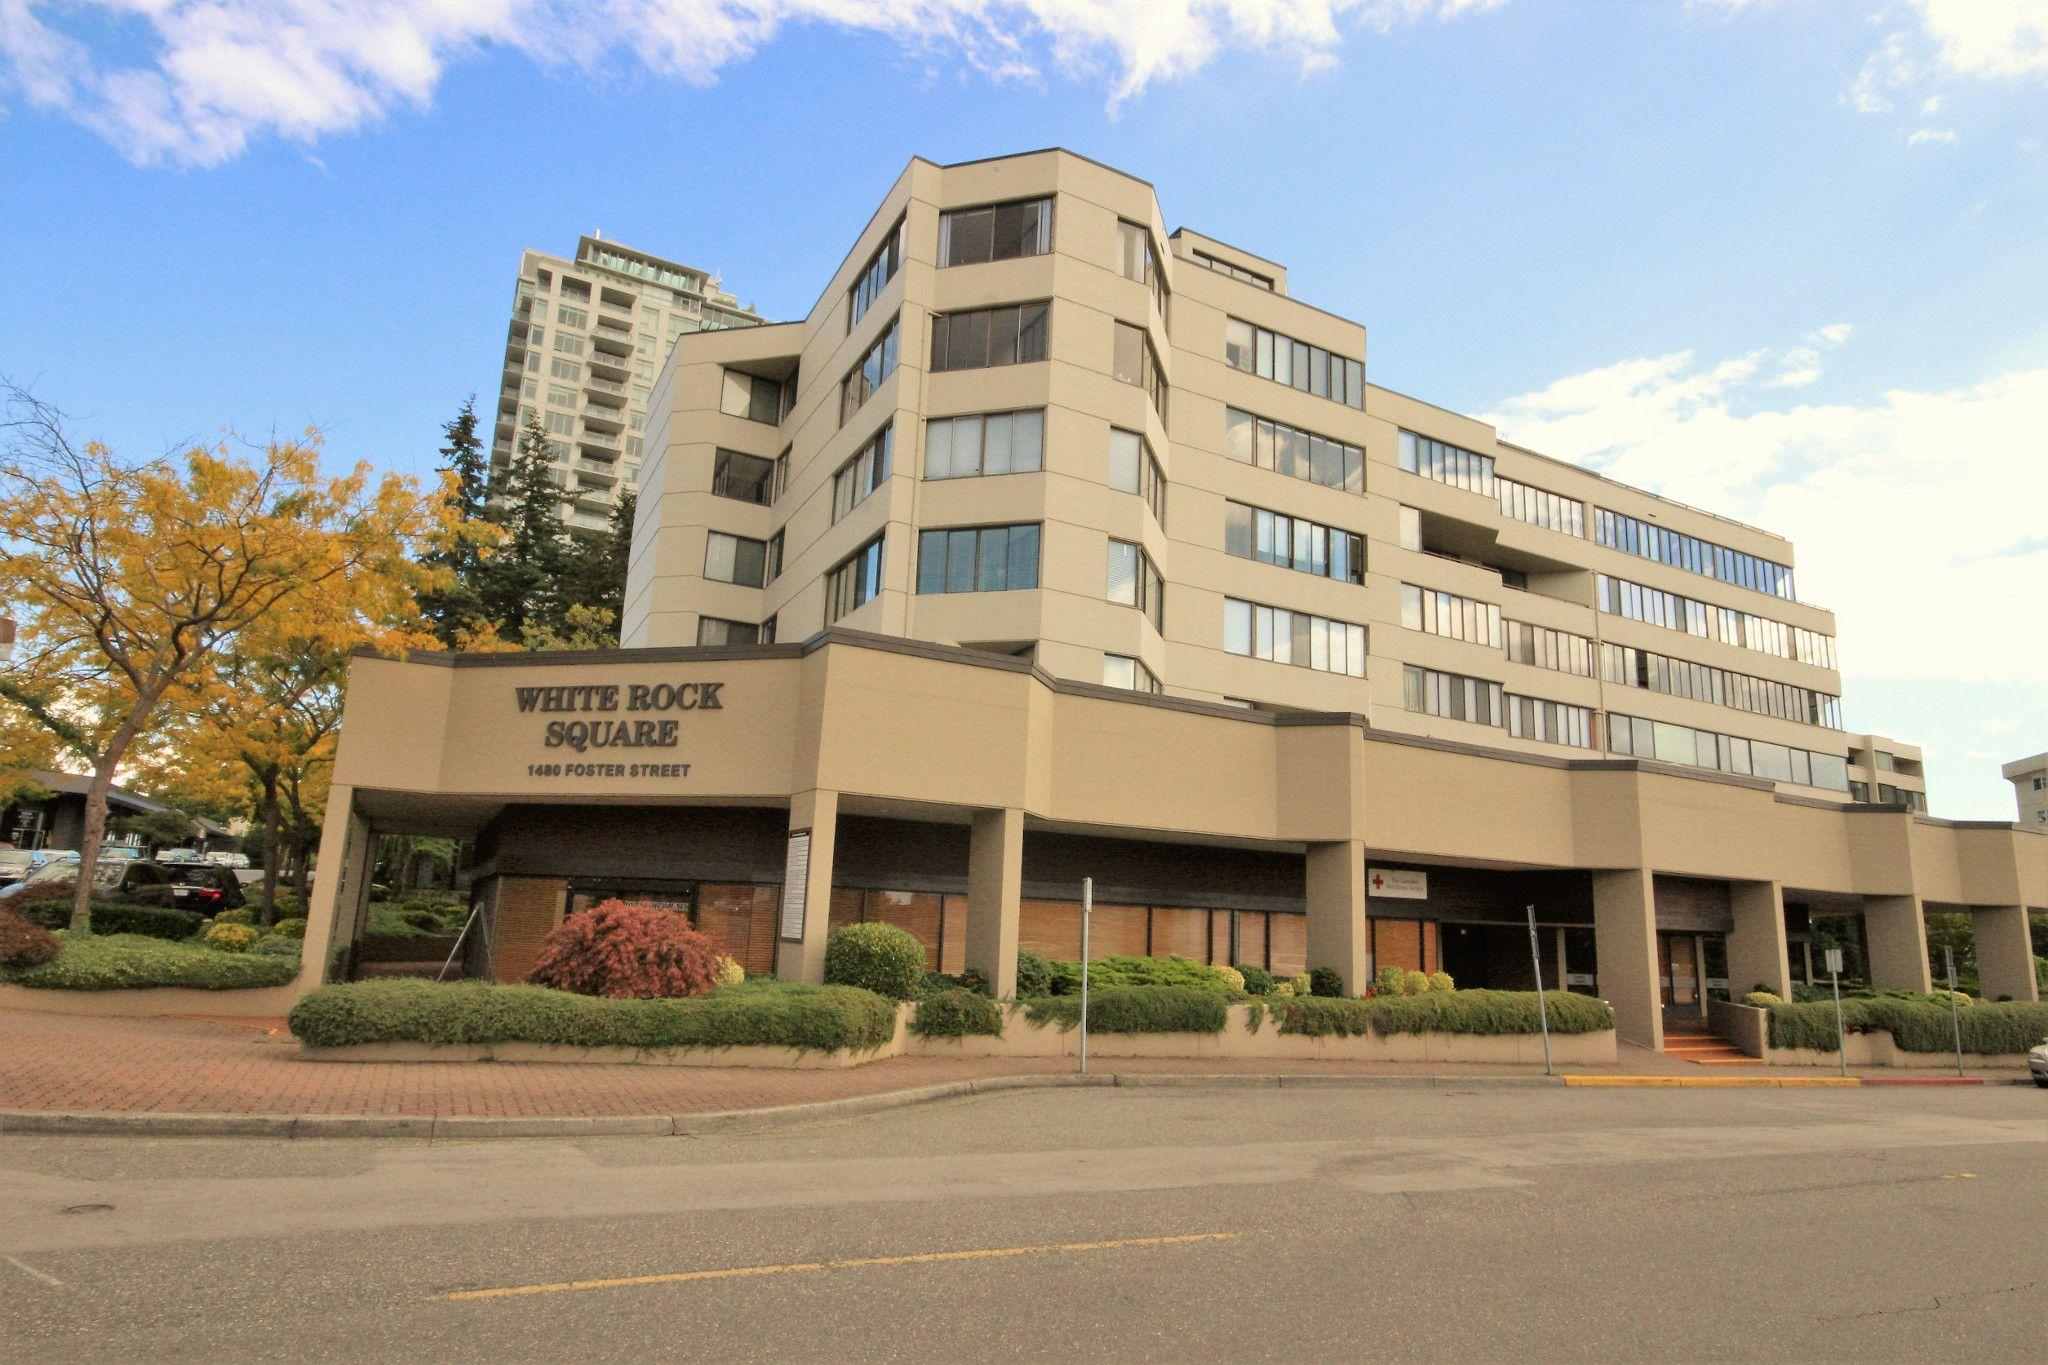 Main Photo: 506 - 1480 Foster St: White Rock Condo for sale (South Surrey White Rock)  : MLS®# R2117828